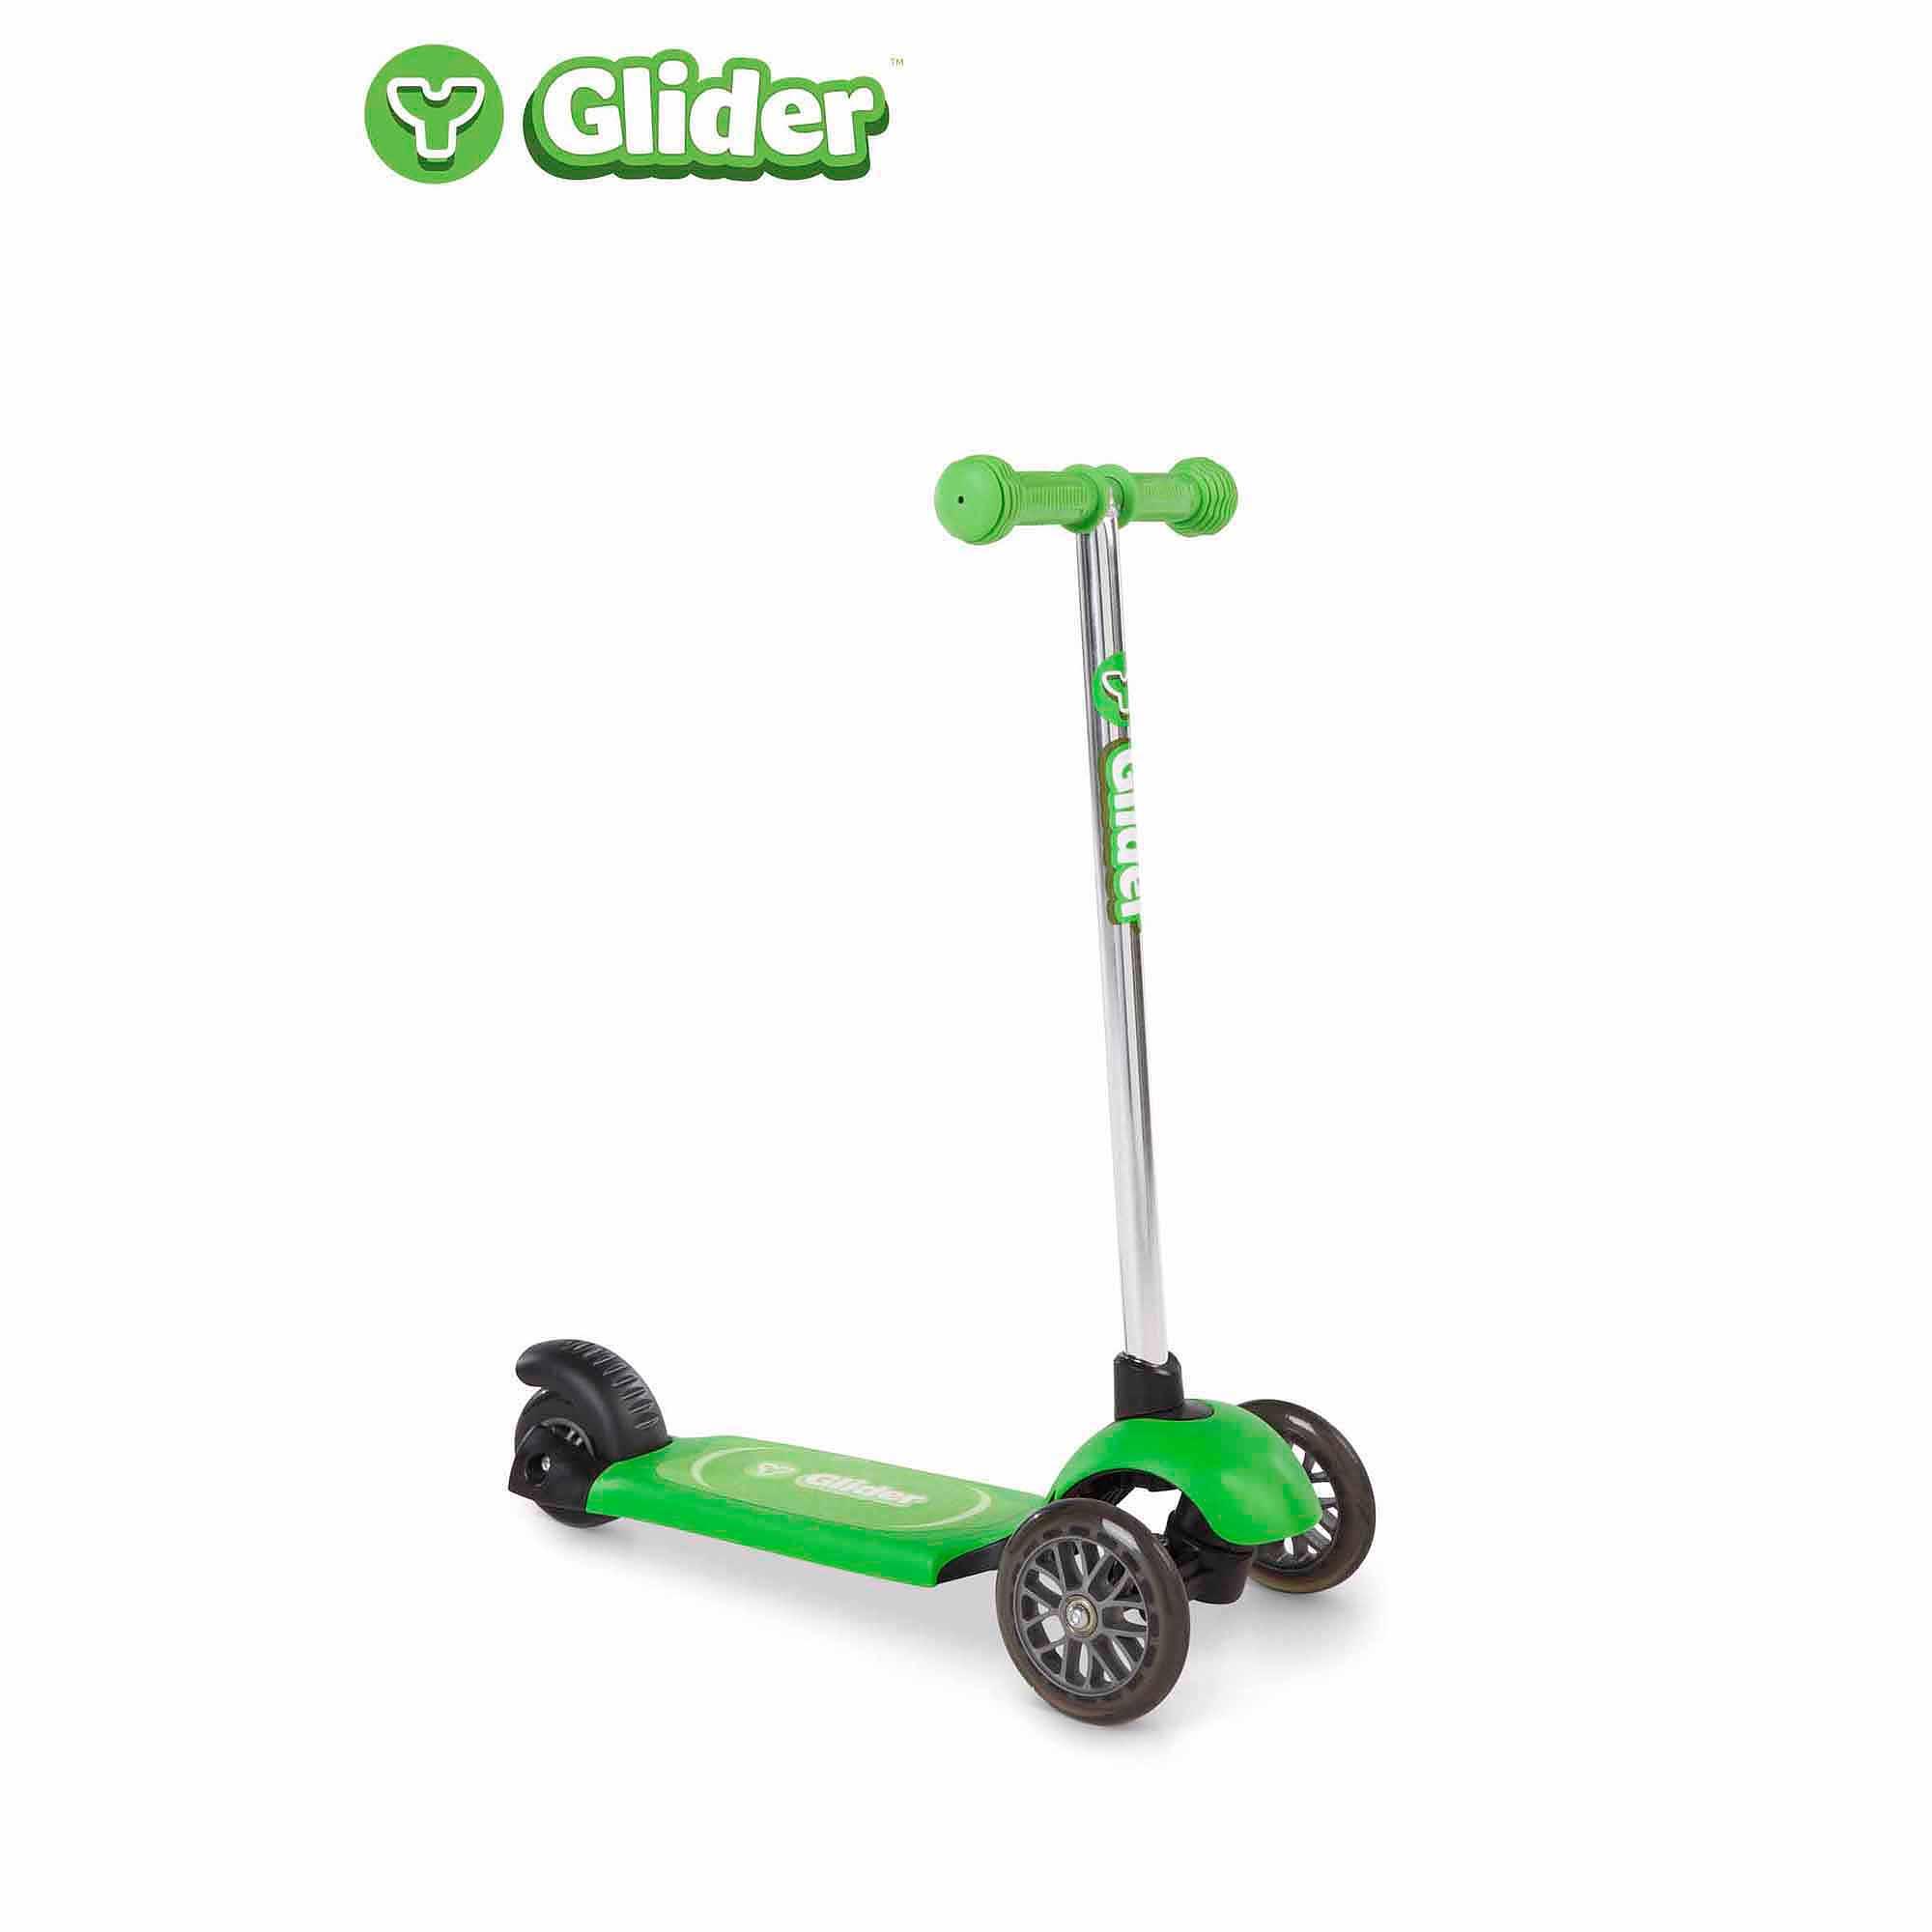 Yvolution Y Glider Scooter, Green